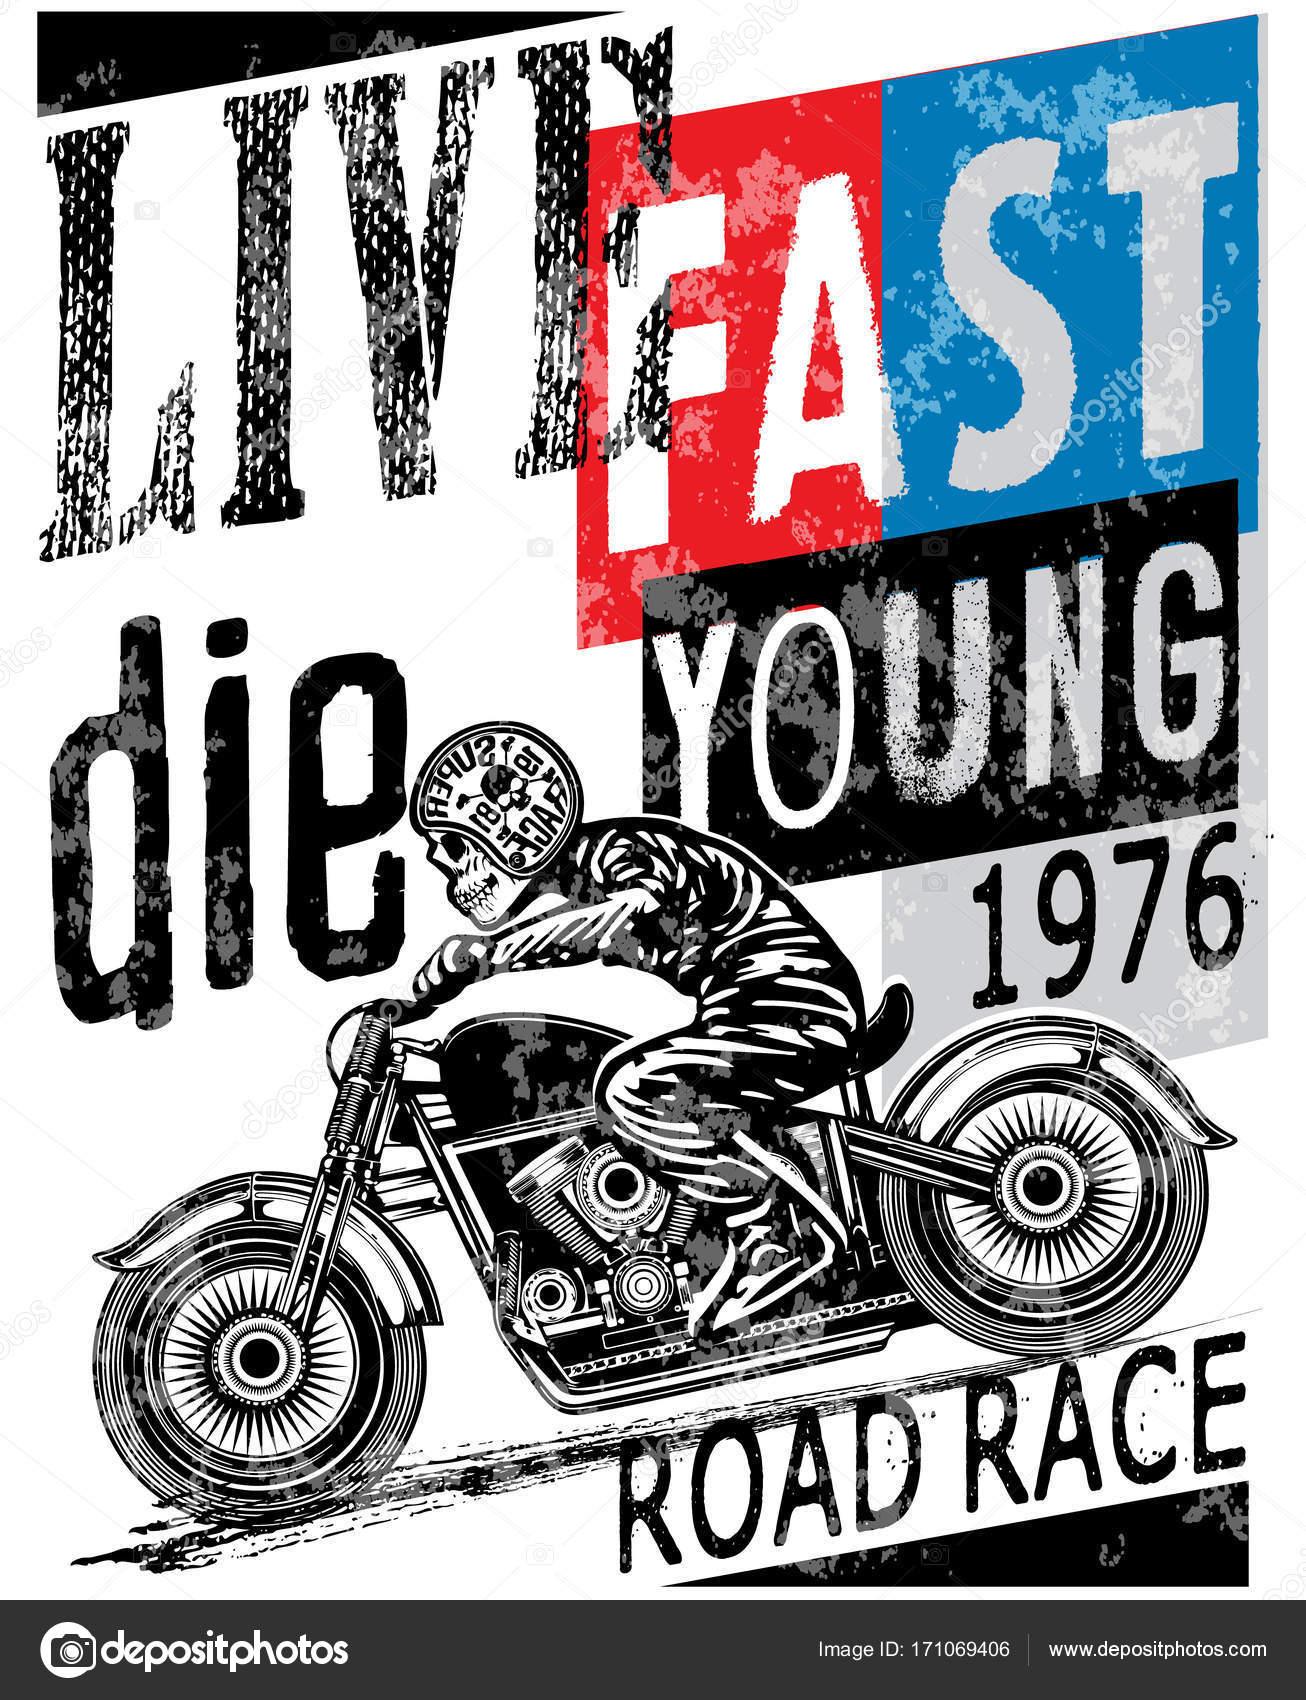 9edcd3de1 Vintage Motorcycle T-shirt Graphic — Stock Vector © emeget #171069406